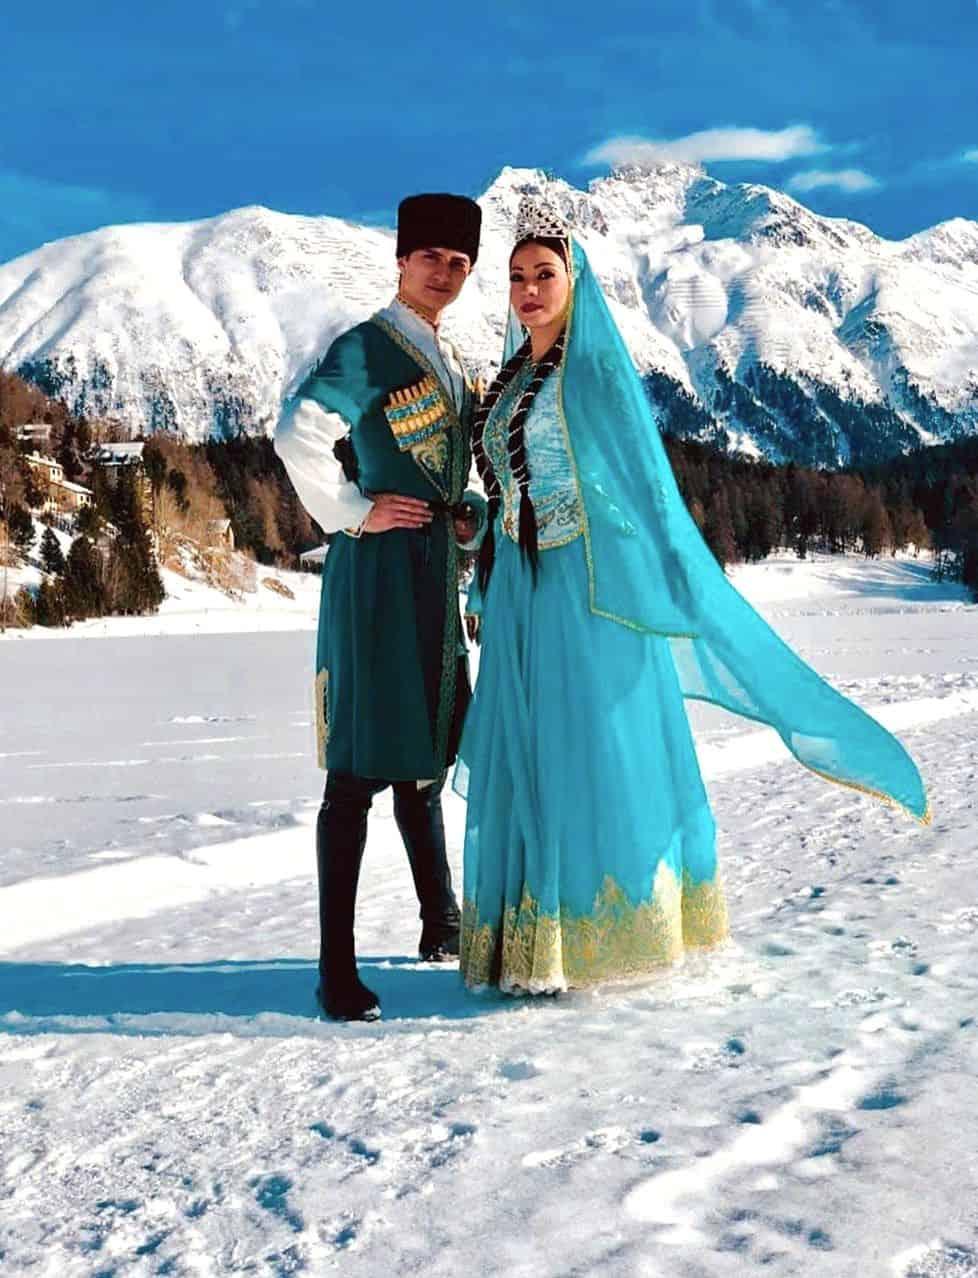 азербайджанцы на фоне гор фото